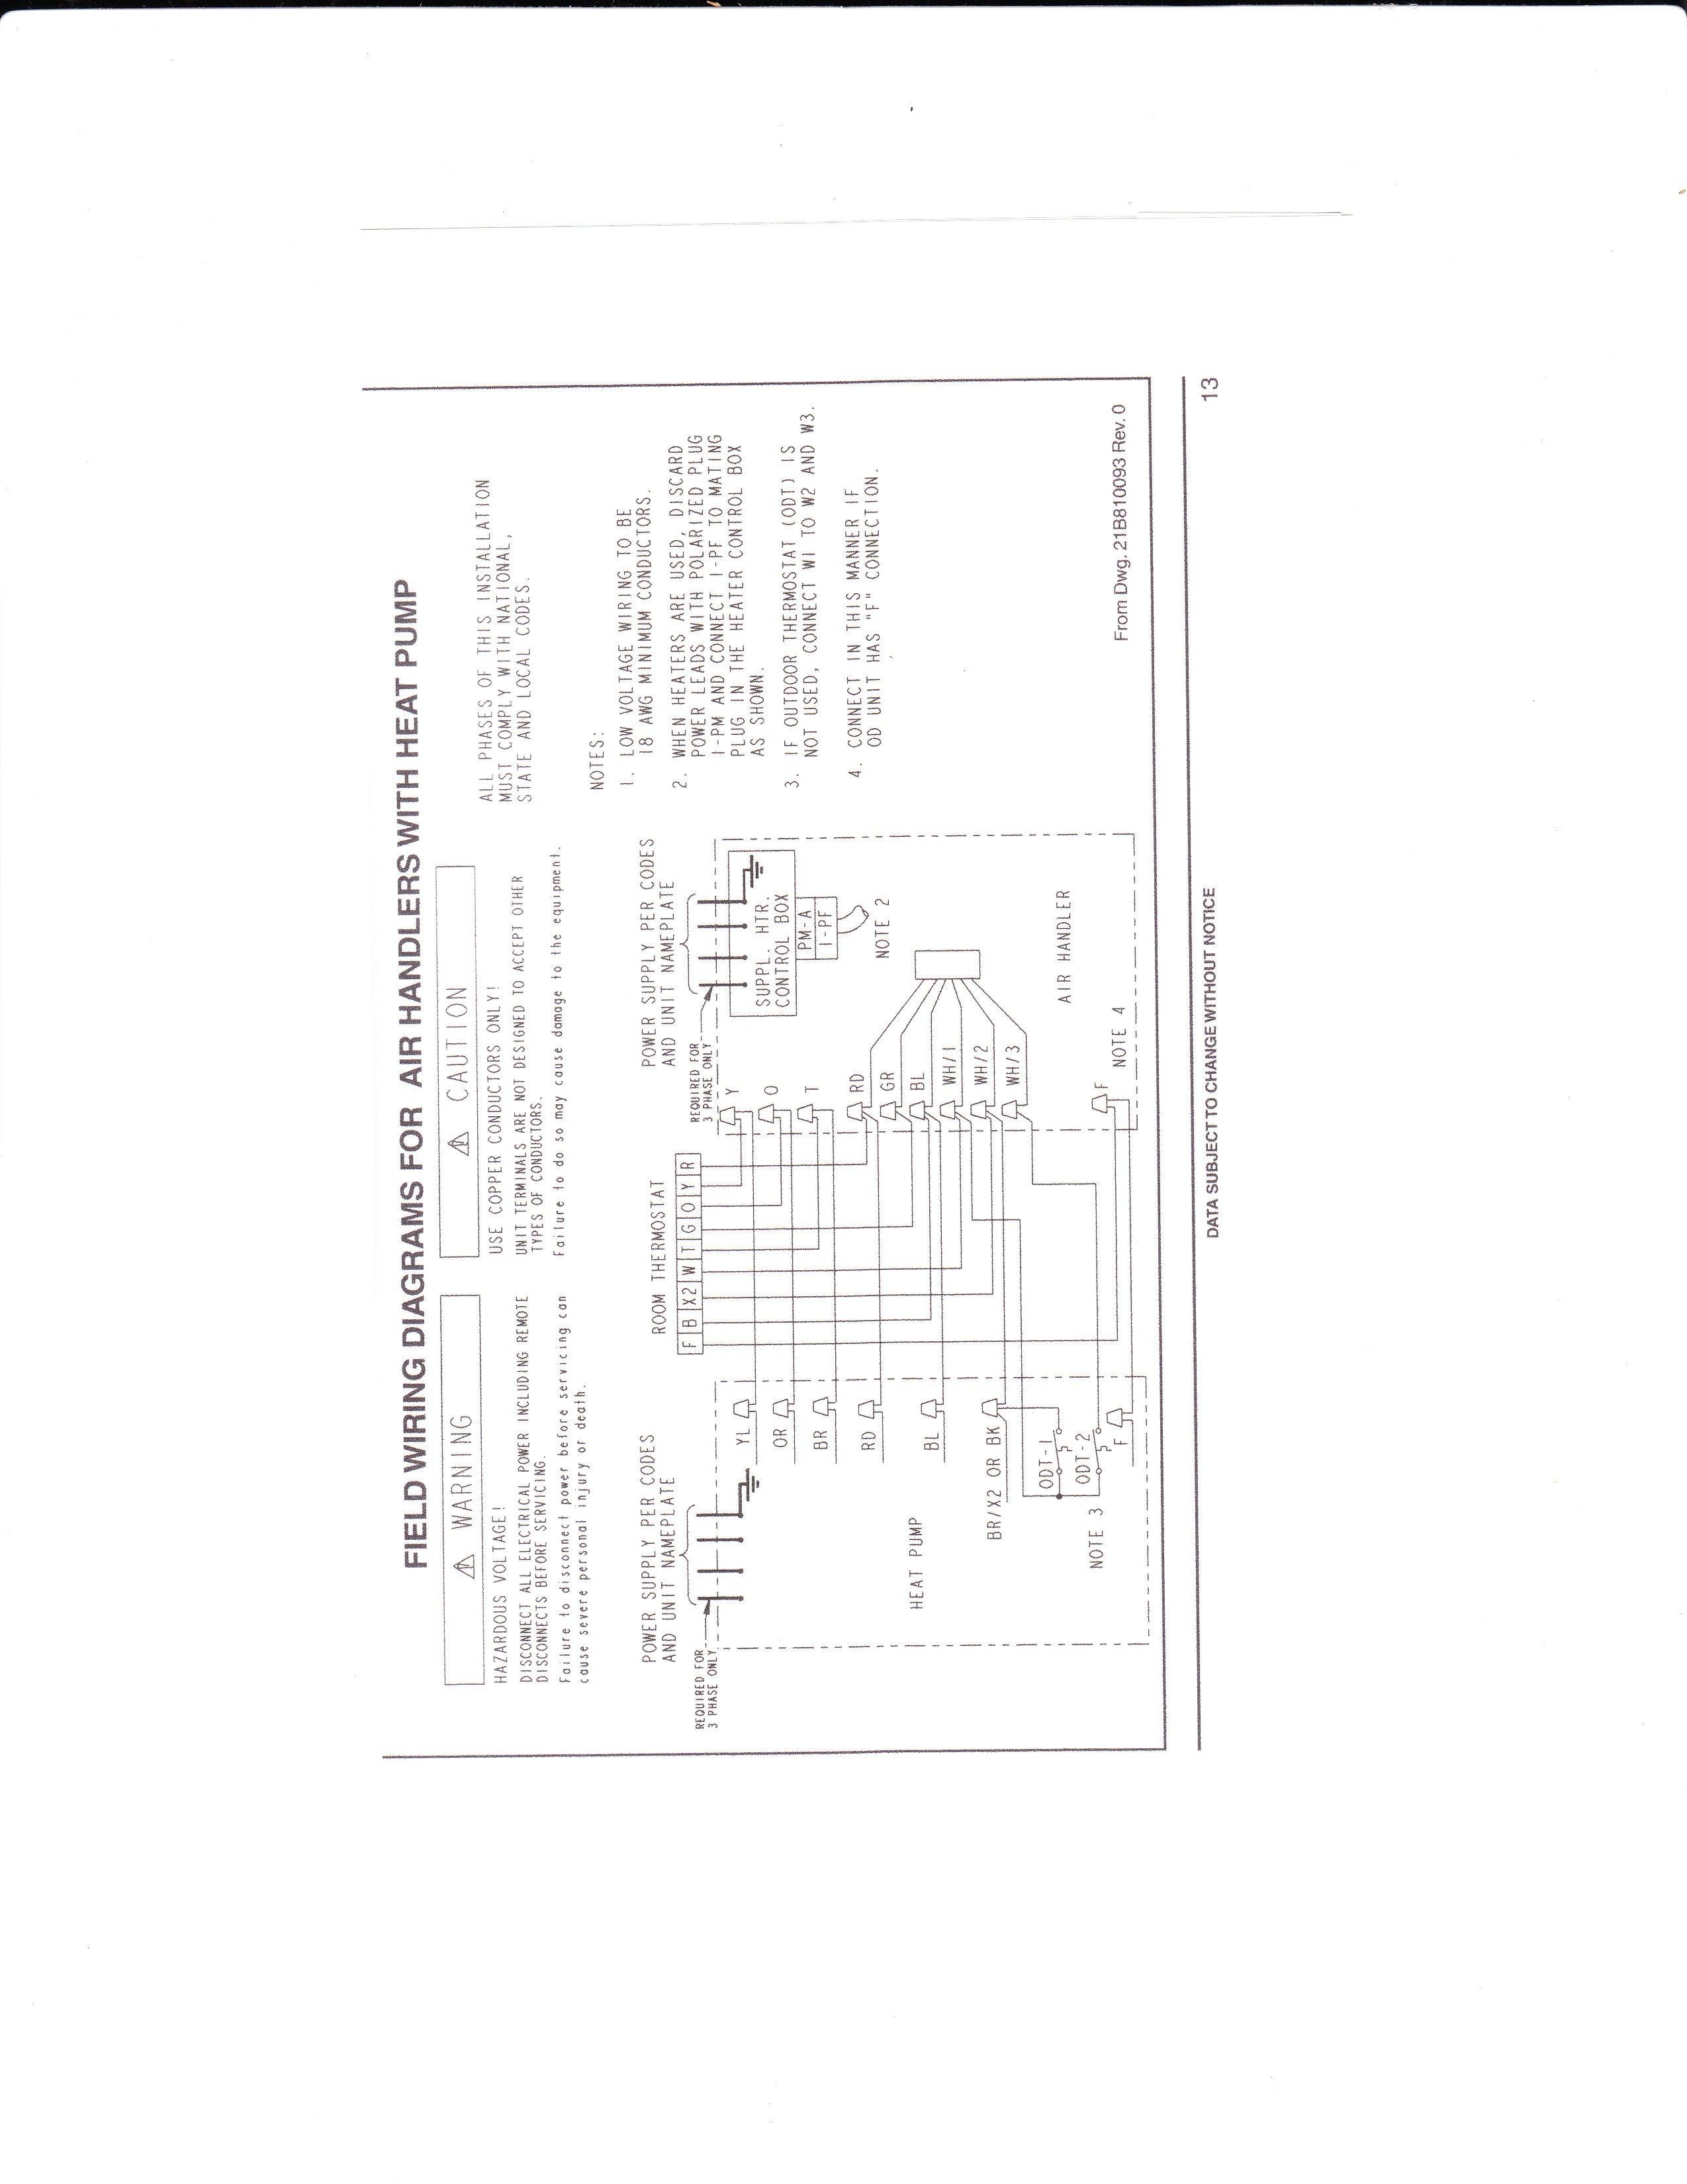 wiring diagram for weathertron thermostat wiring diagram